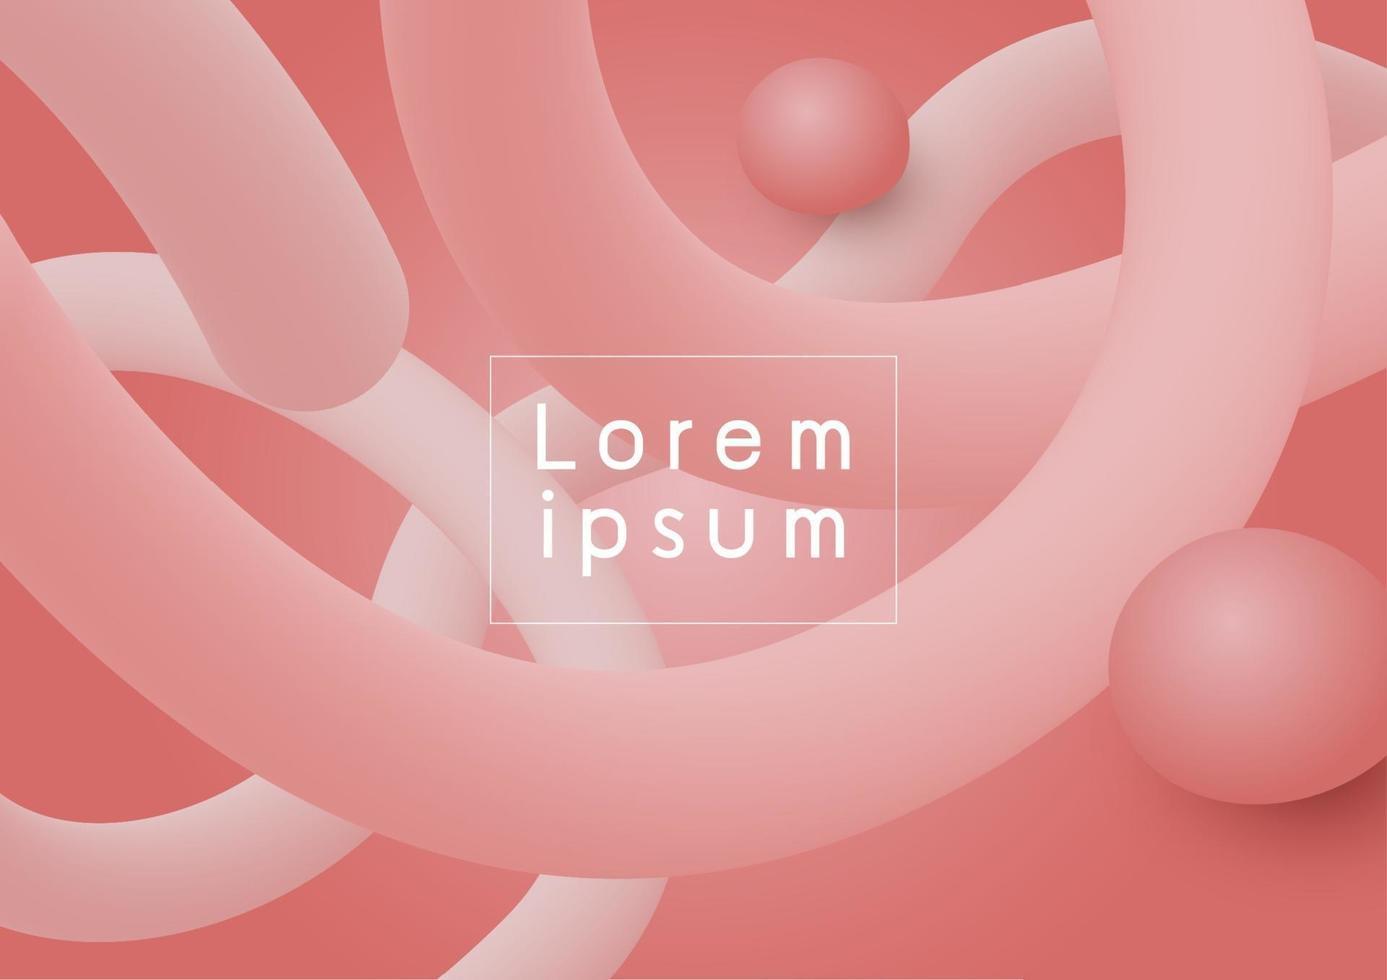 abstrakter moderner Hintergrundentwurf der fließenden Vektorillustration der fließenden Korallenfarbe 3d vektor